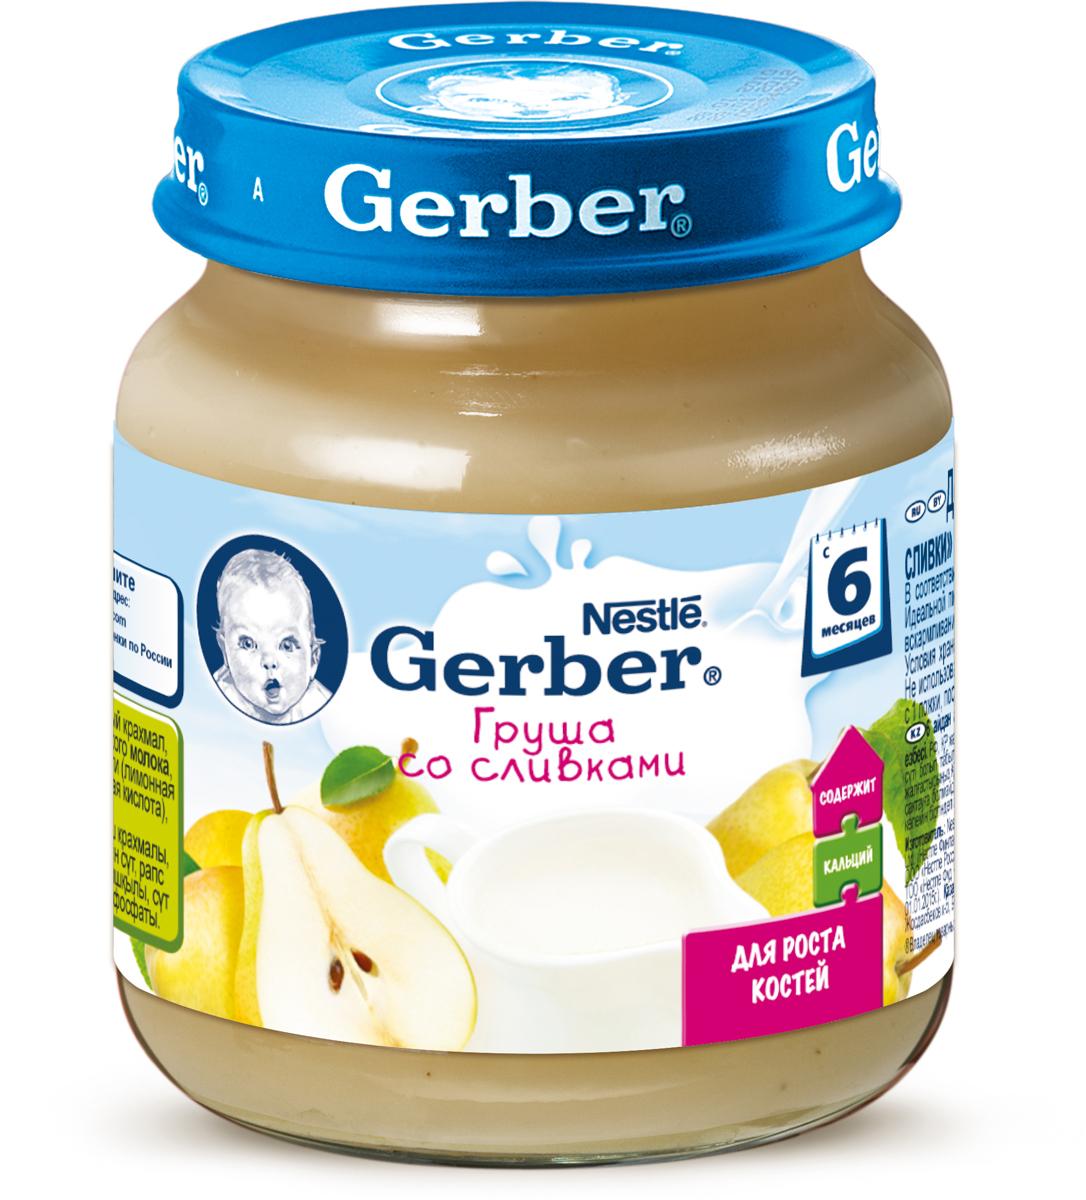 Gerber пюре груша со сливками, с 6 месяцев, 125 г gerber пюре груши вильямс с 4 месяцев 12 шт по 80 г